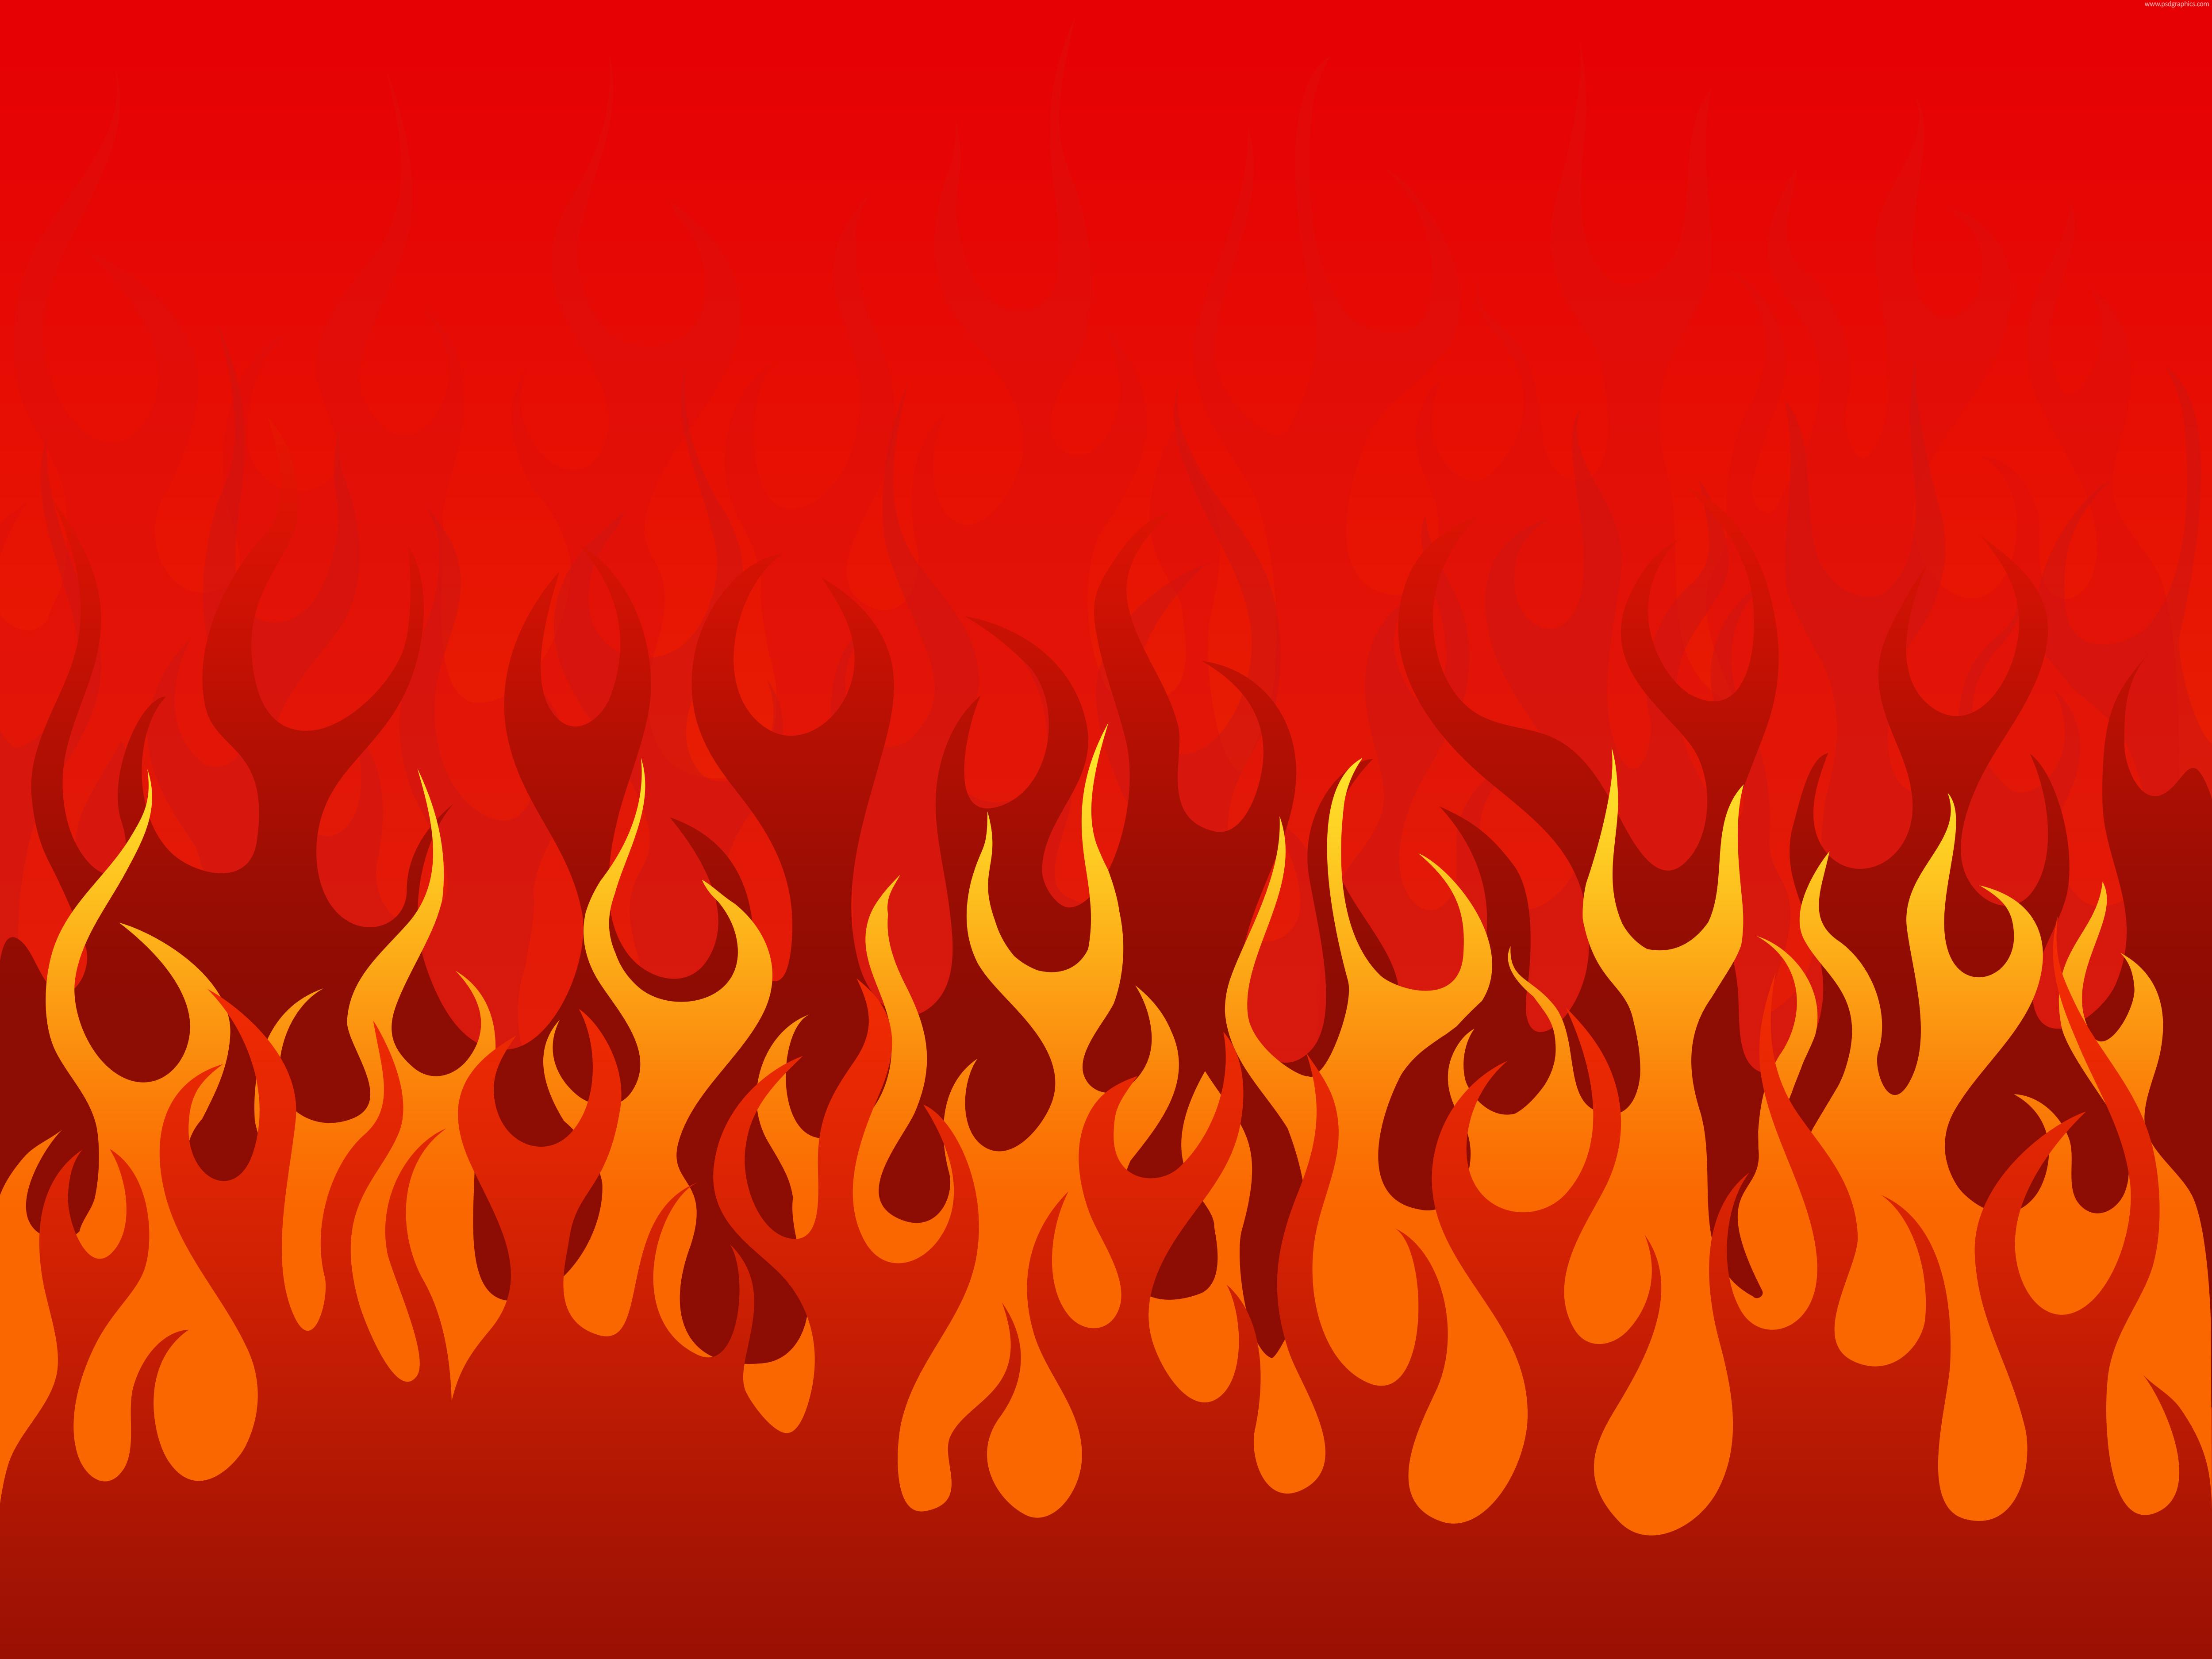 Burning flames illustration